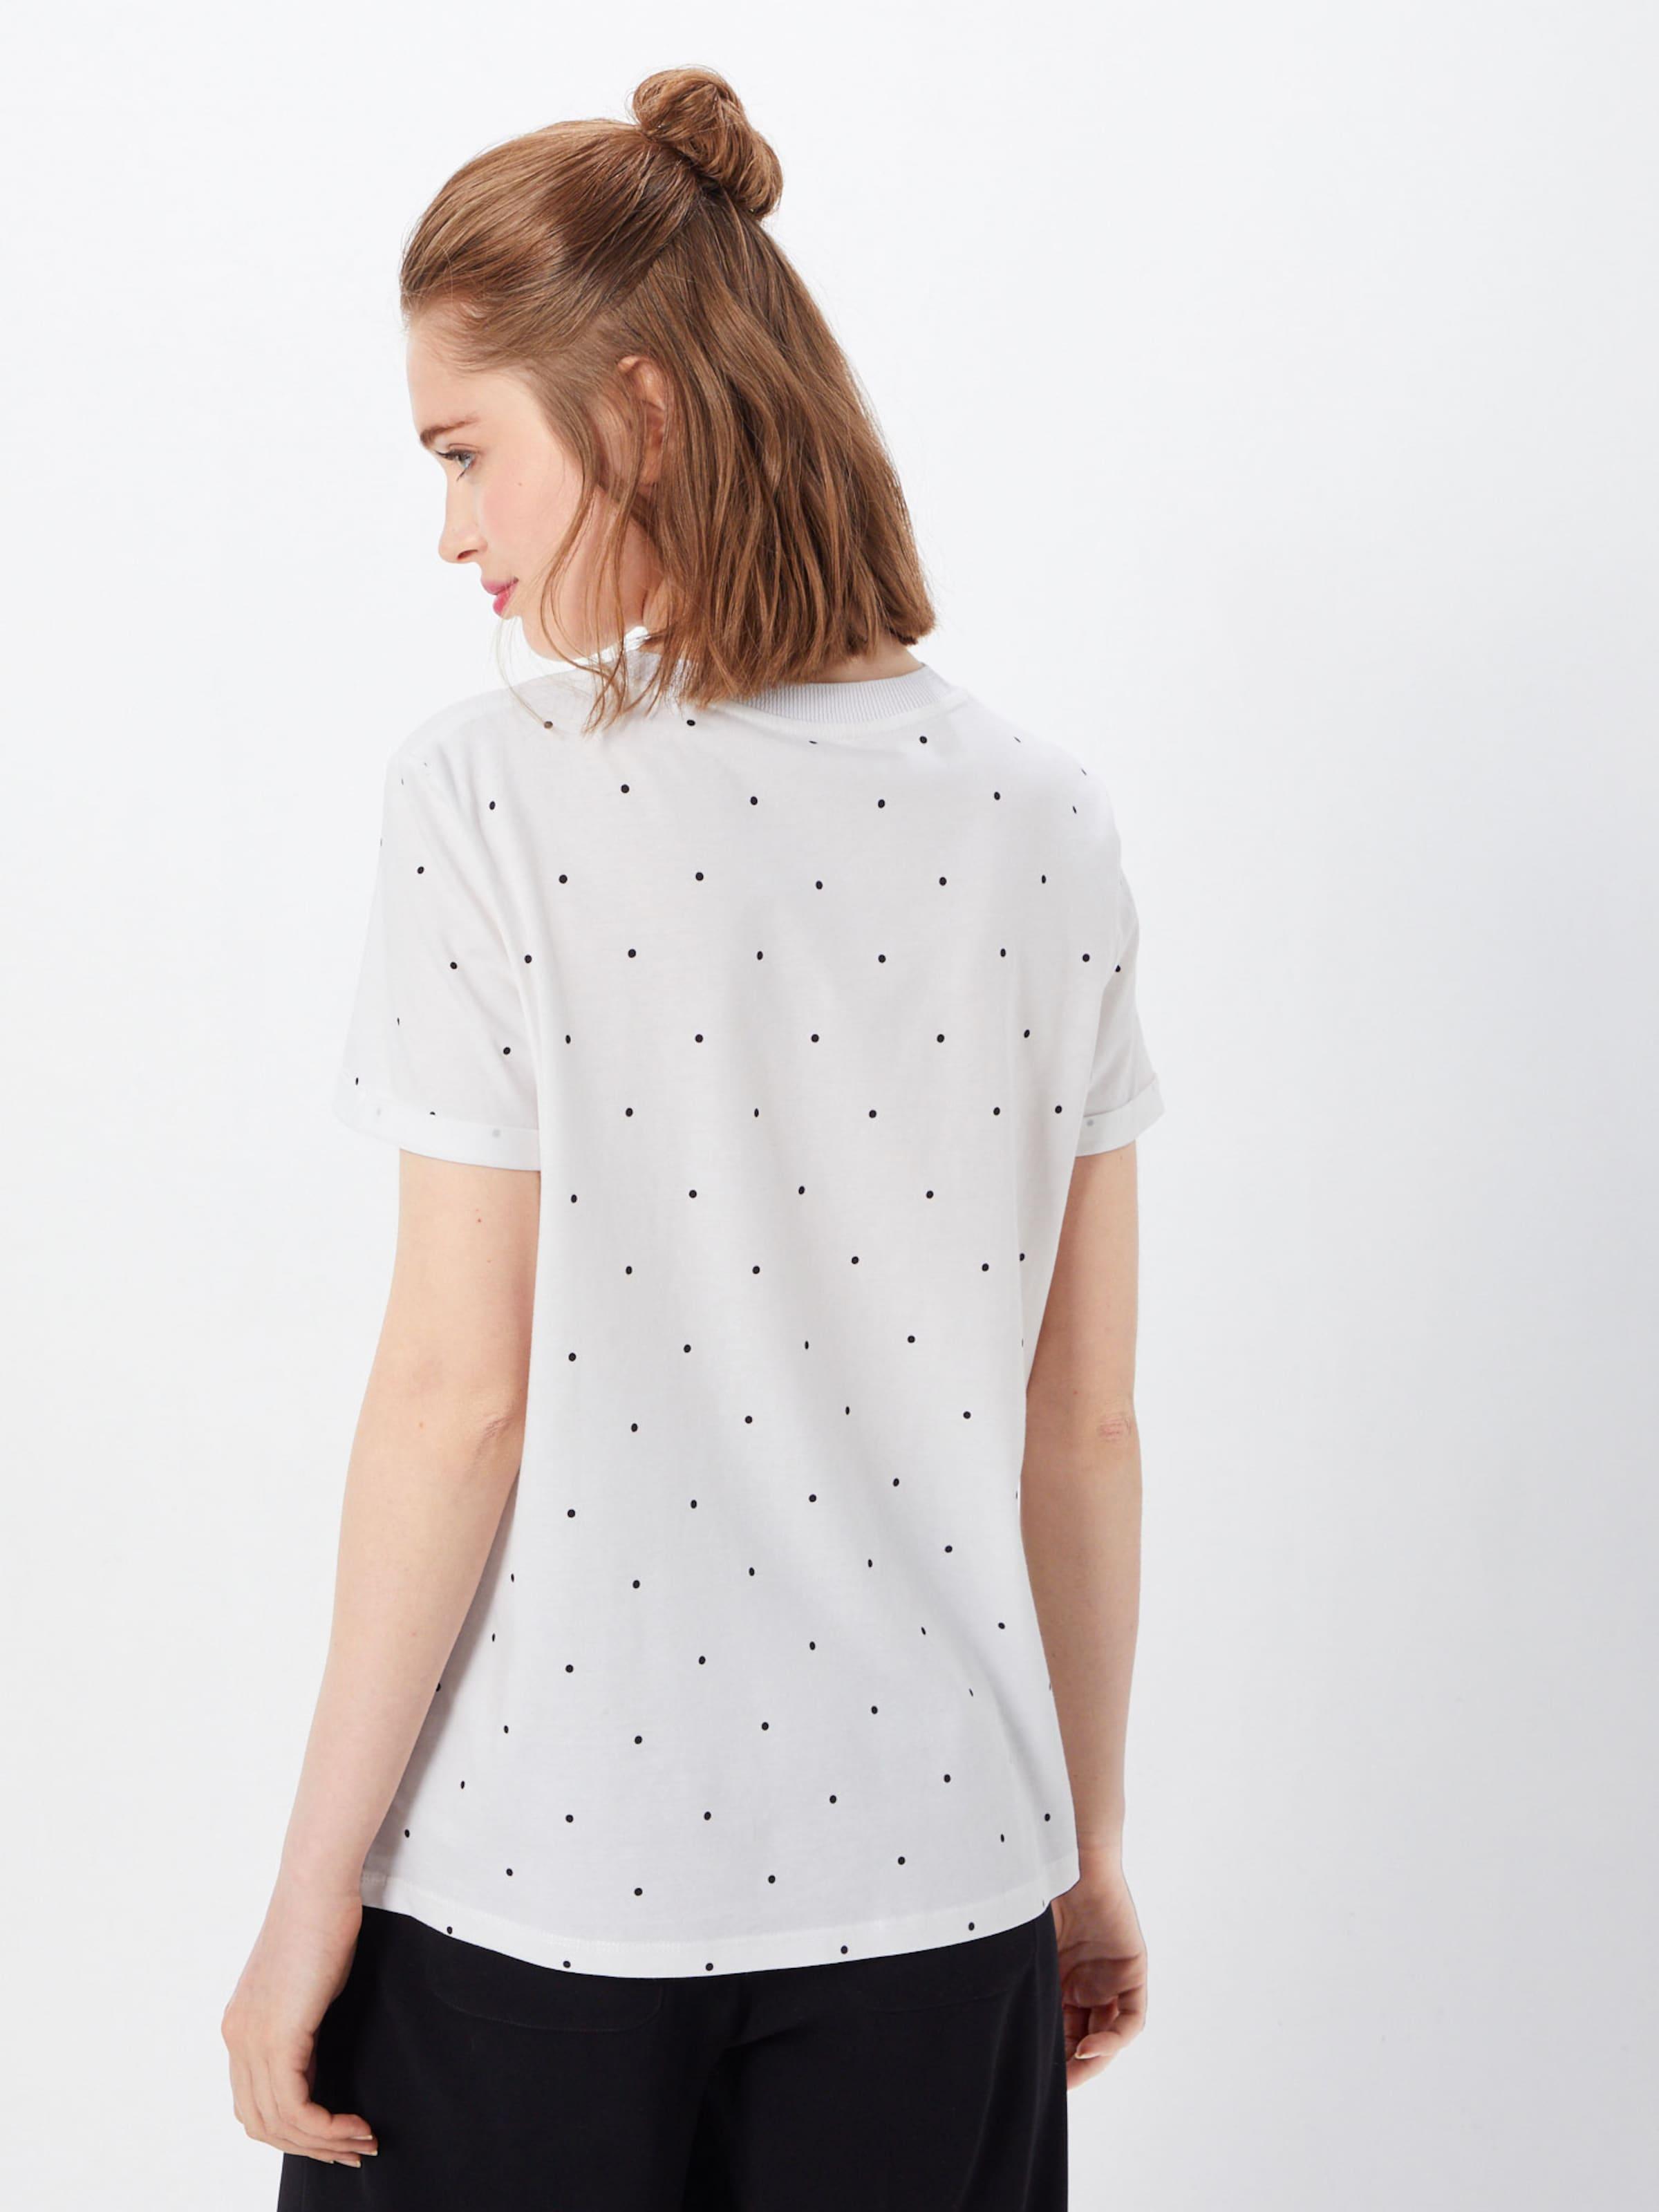 shirt shirt T NoirBlanc Talkabout En Talkabout T En T shirt NoirBlanc Talkabout E2Ieb9YWDH